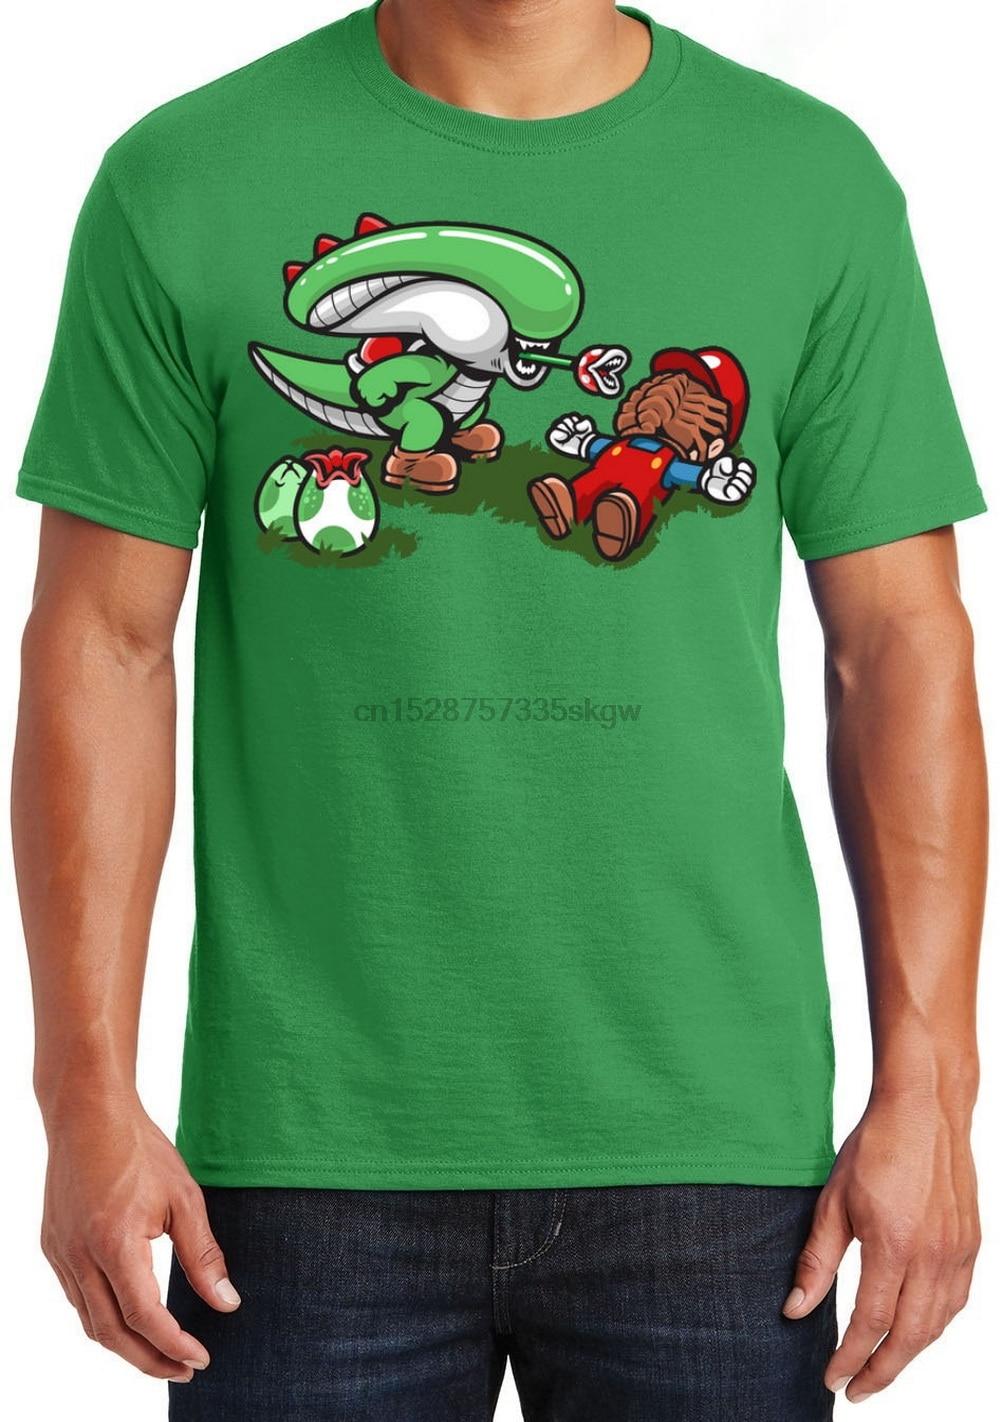 Super Mario Bros Camisetas para hombre Unisex algodón adulto tamaño Xenomorph Alien divertido cuello redondo Camiseta